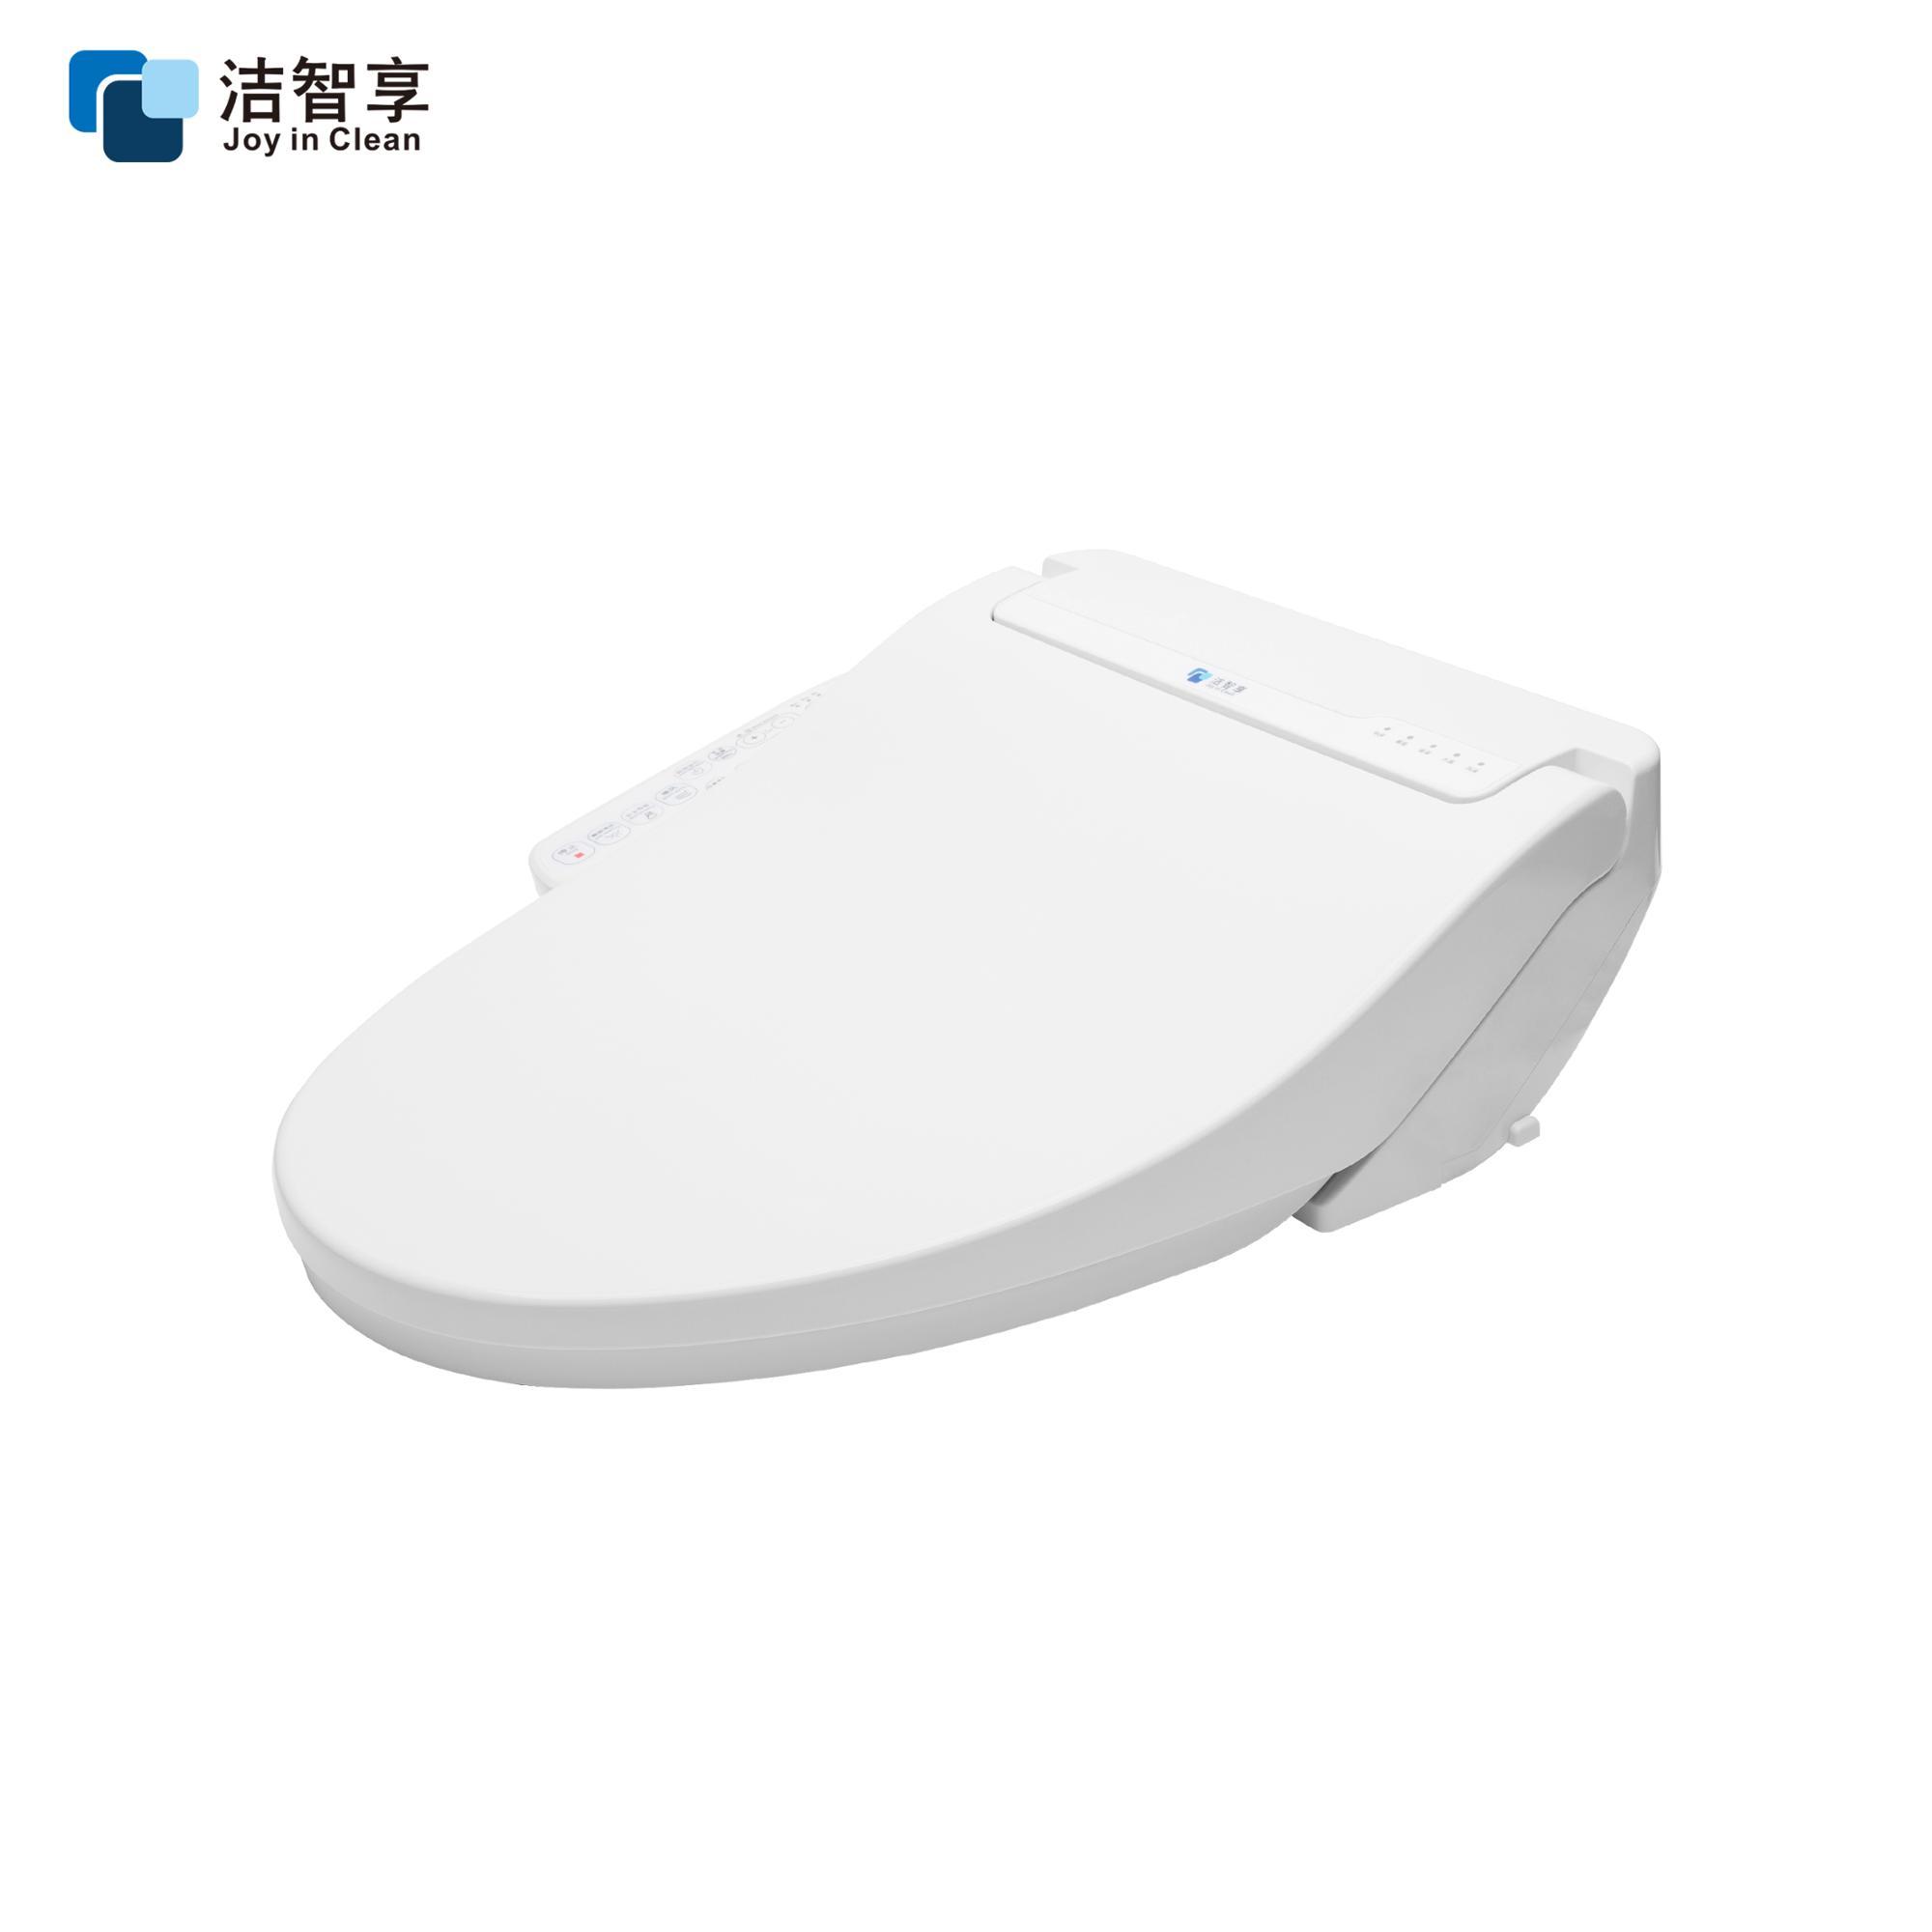 Tremendous Heated Toilet Seat Battery Operated Electronic Toilet Seat Inzonedesignstudio Interior Chair Design Inzonedesignstudiocom